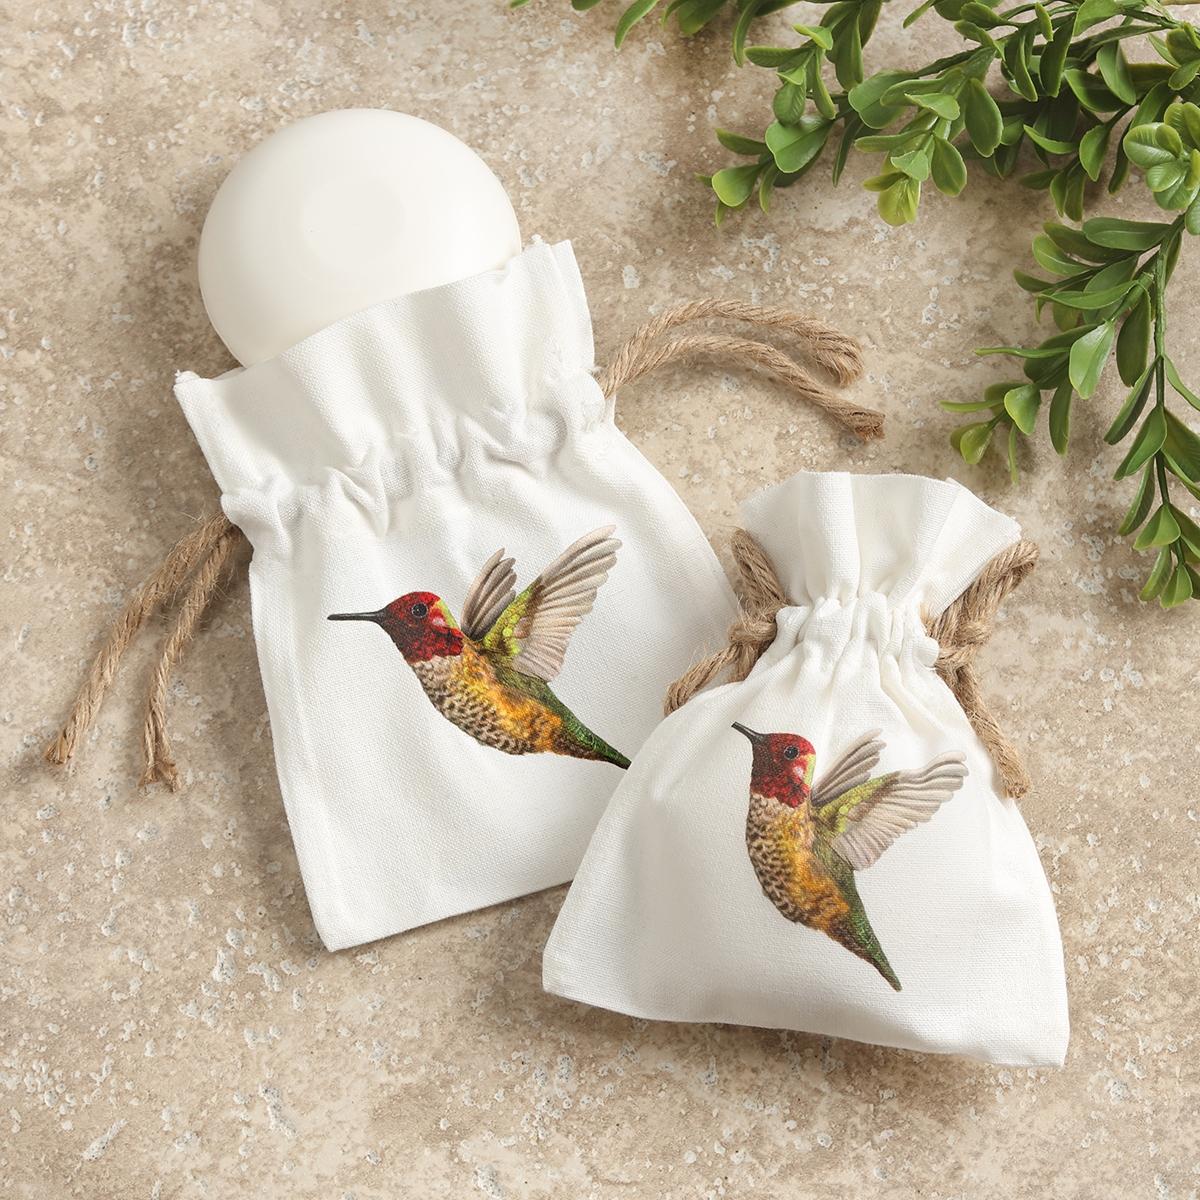 Hummingbird Sack of Soap